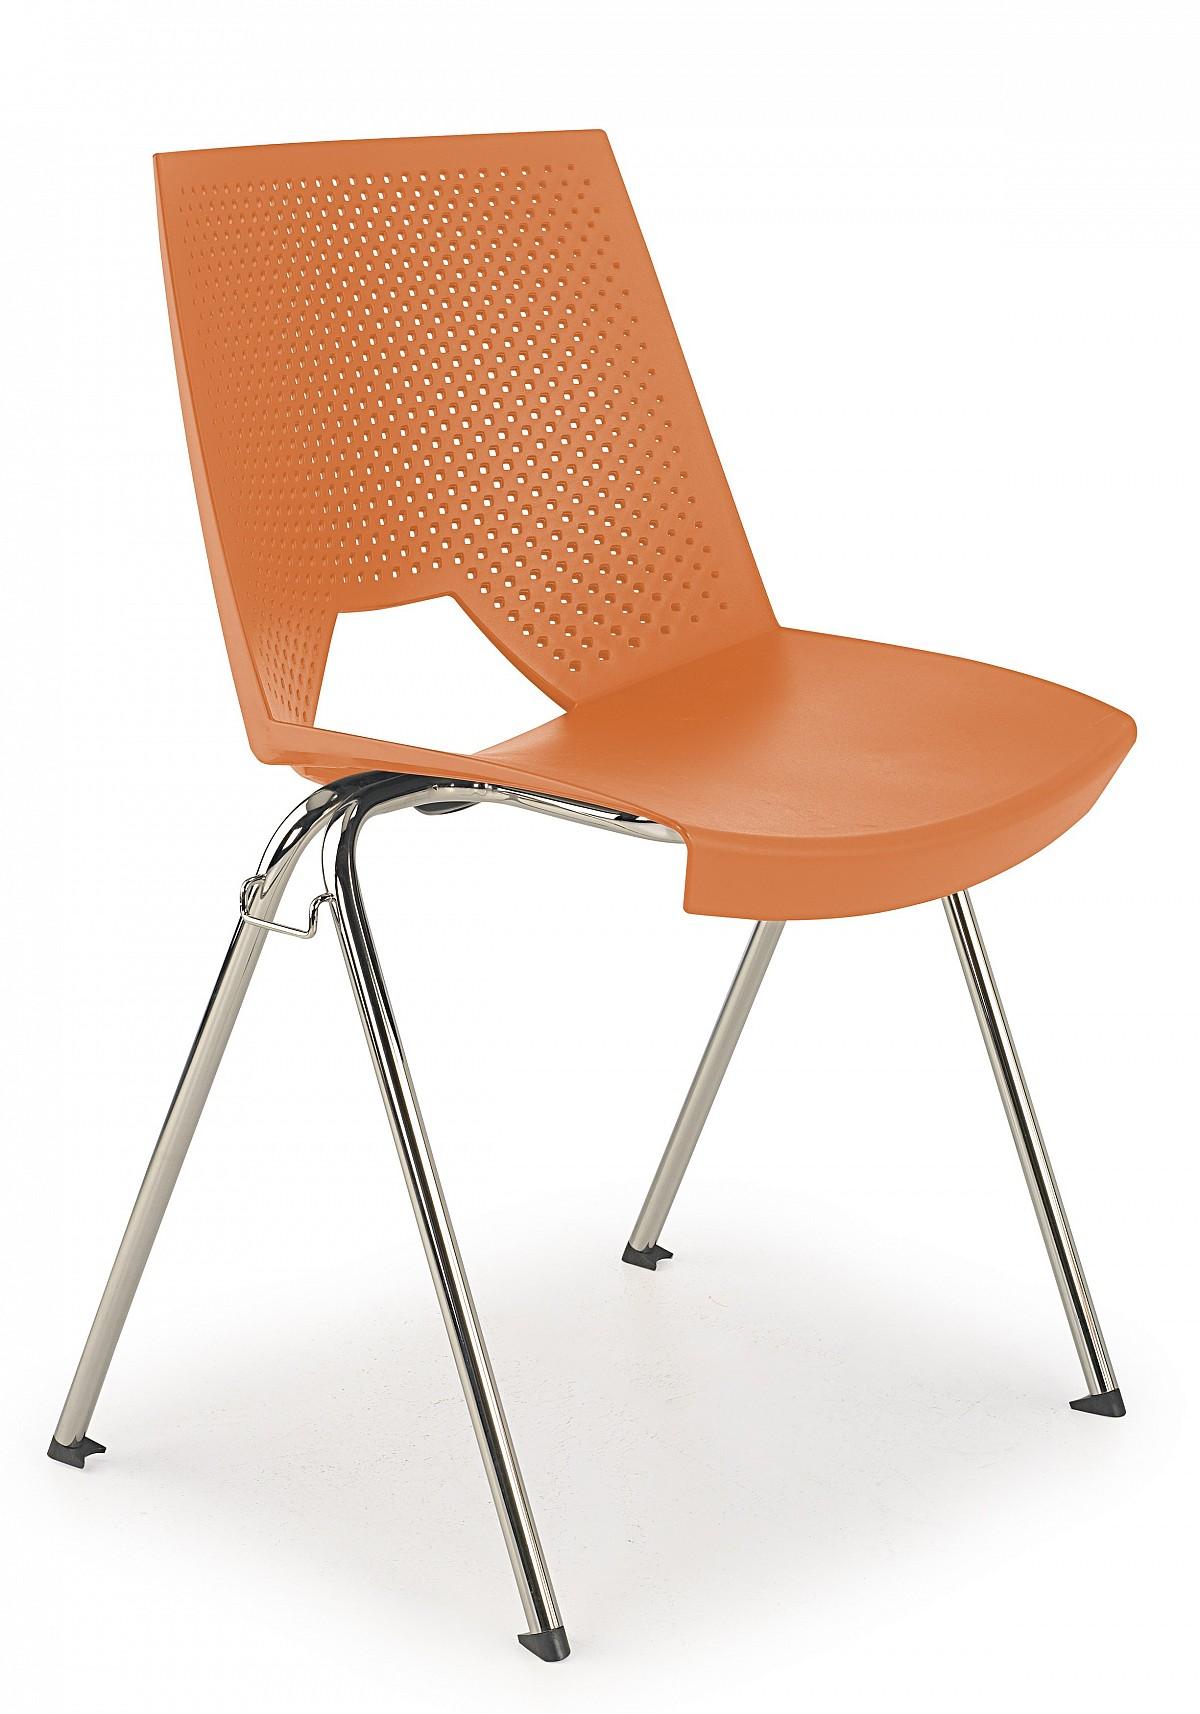 Sillas con ruedas o sillas sin ruedas cu ndo usar cada for Silla de proposito comedor